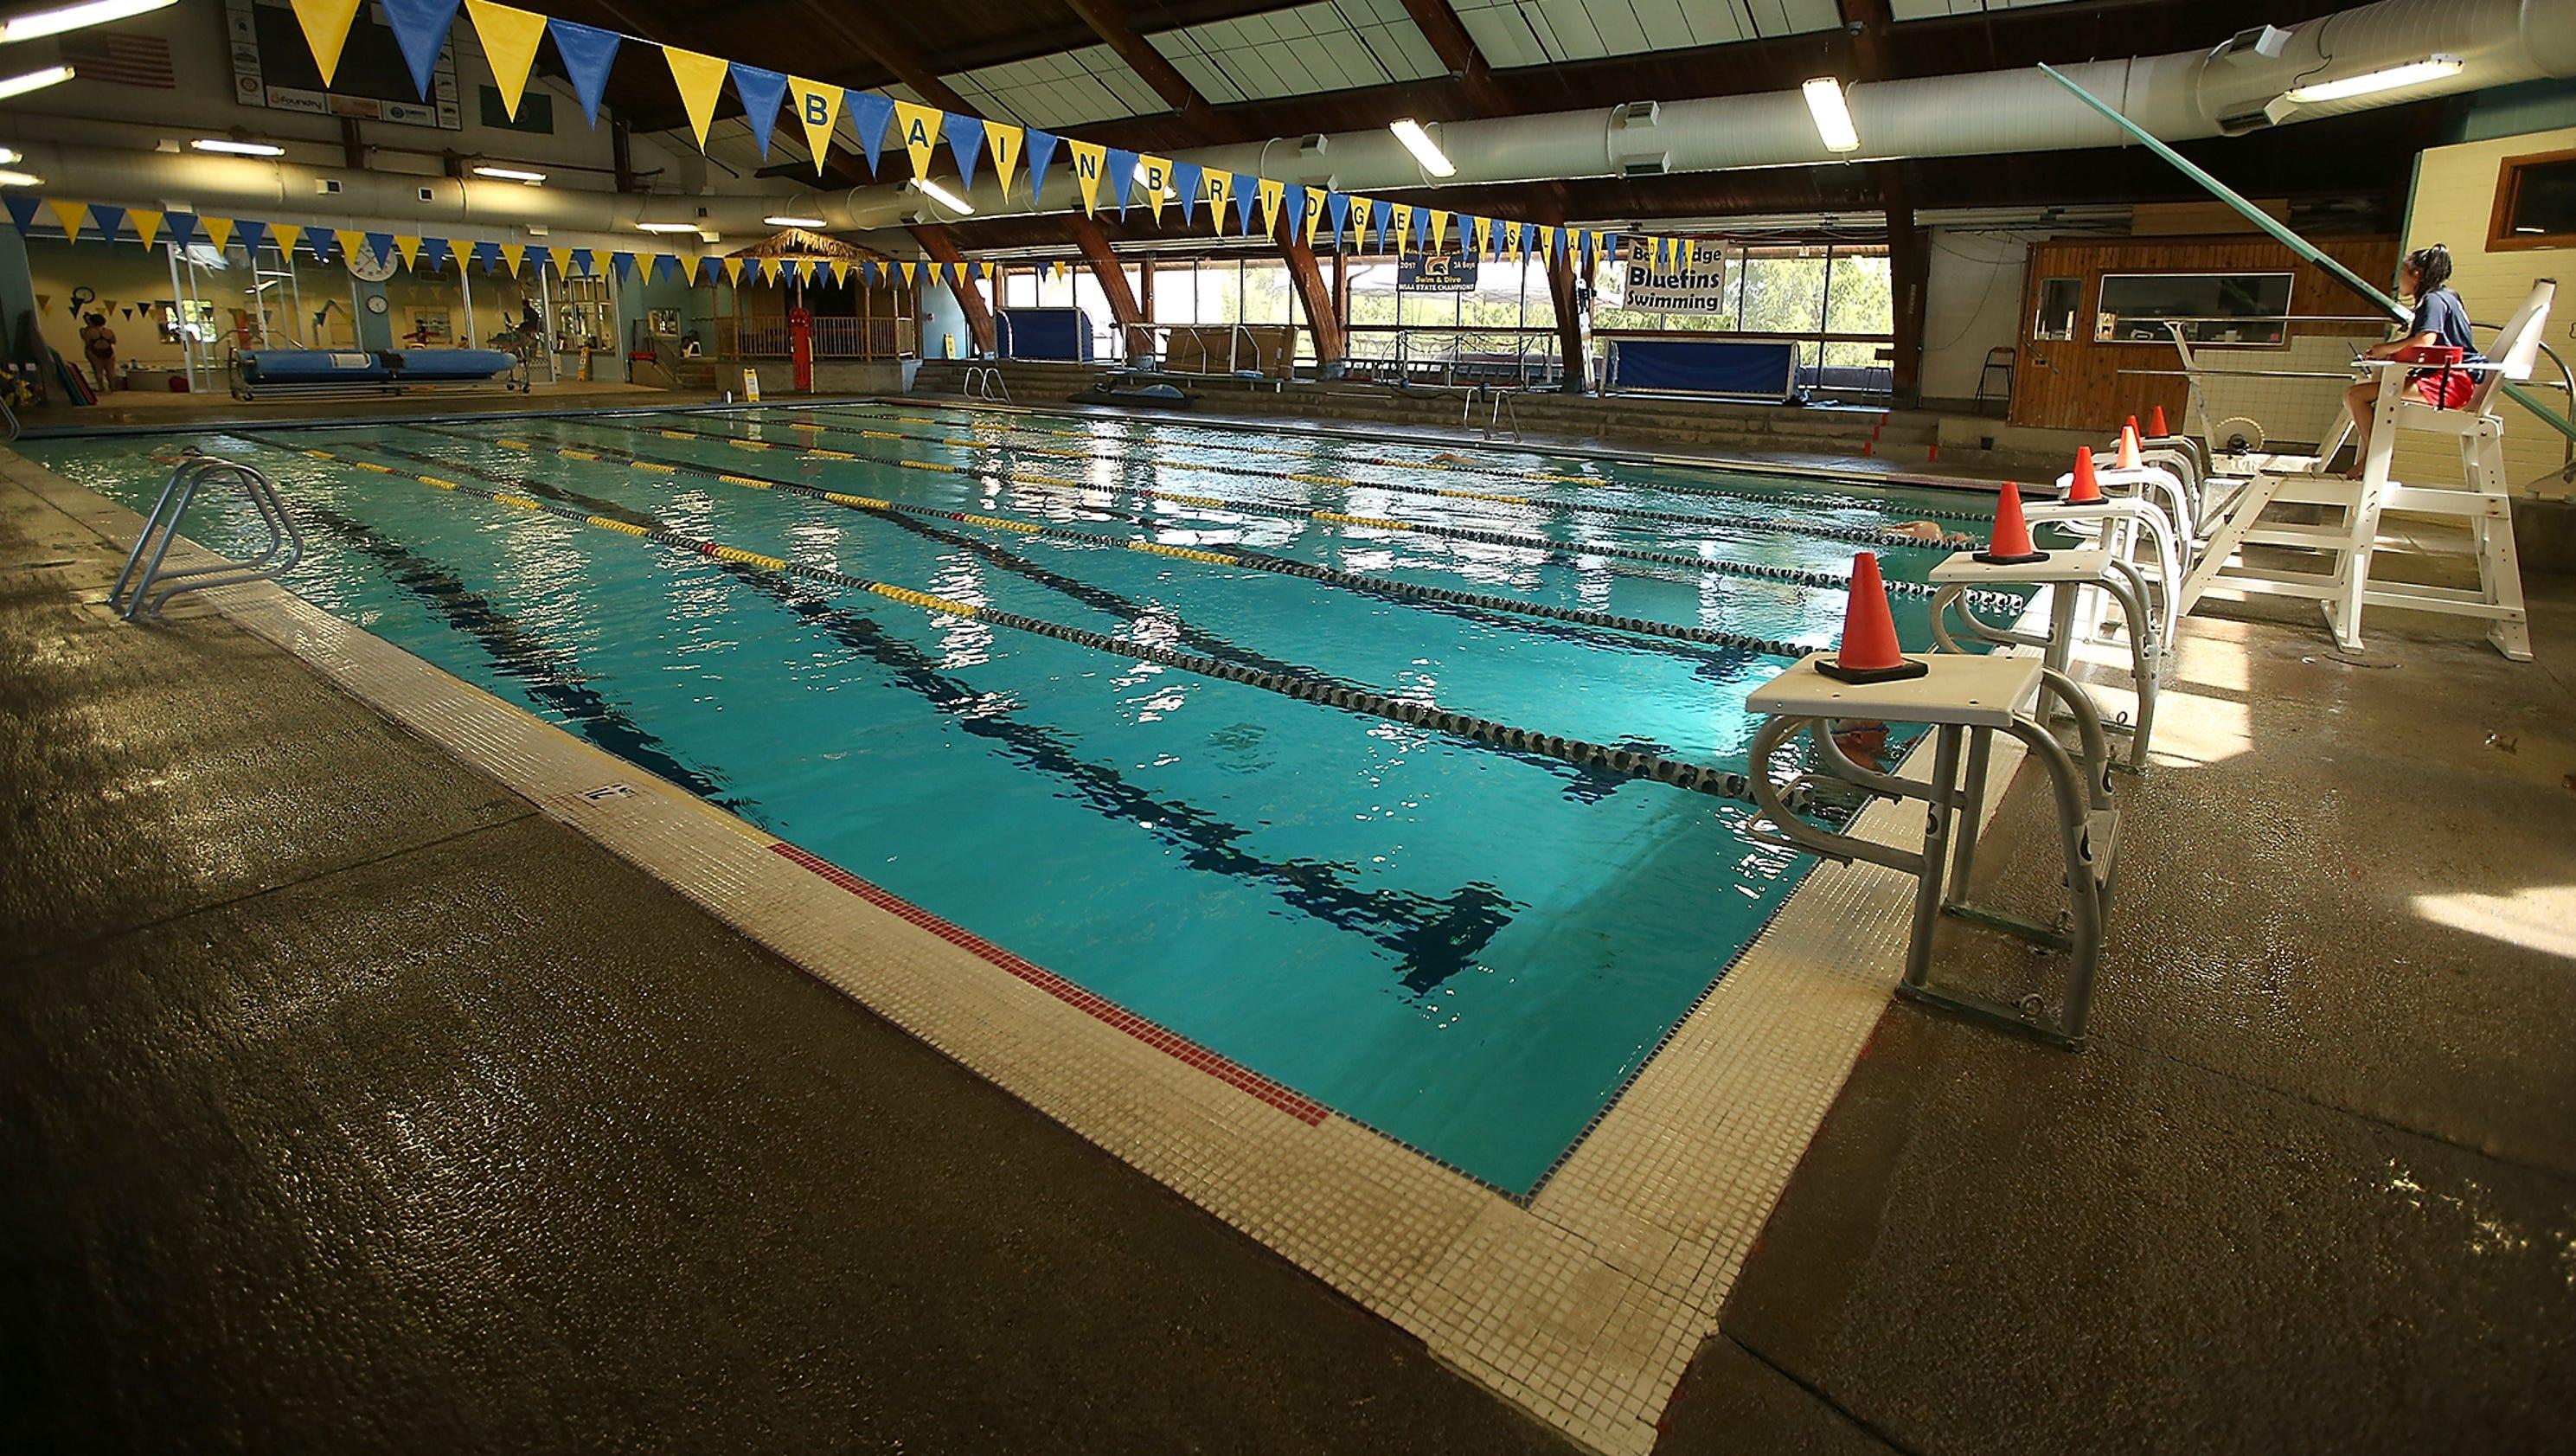 Bainbridge district considering repairs, replacement for pool